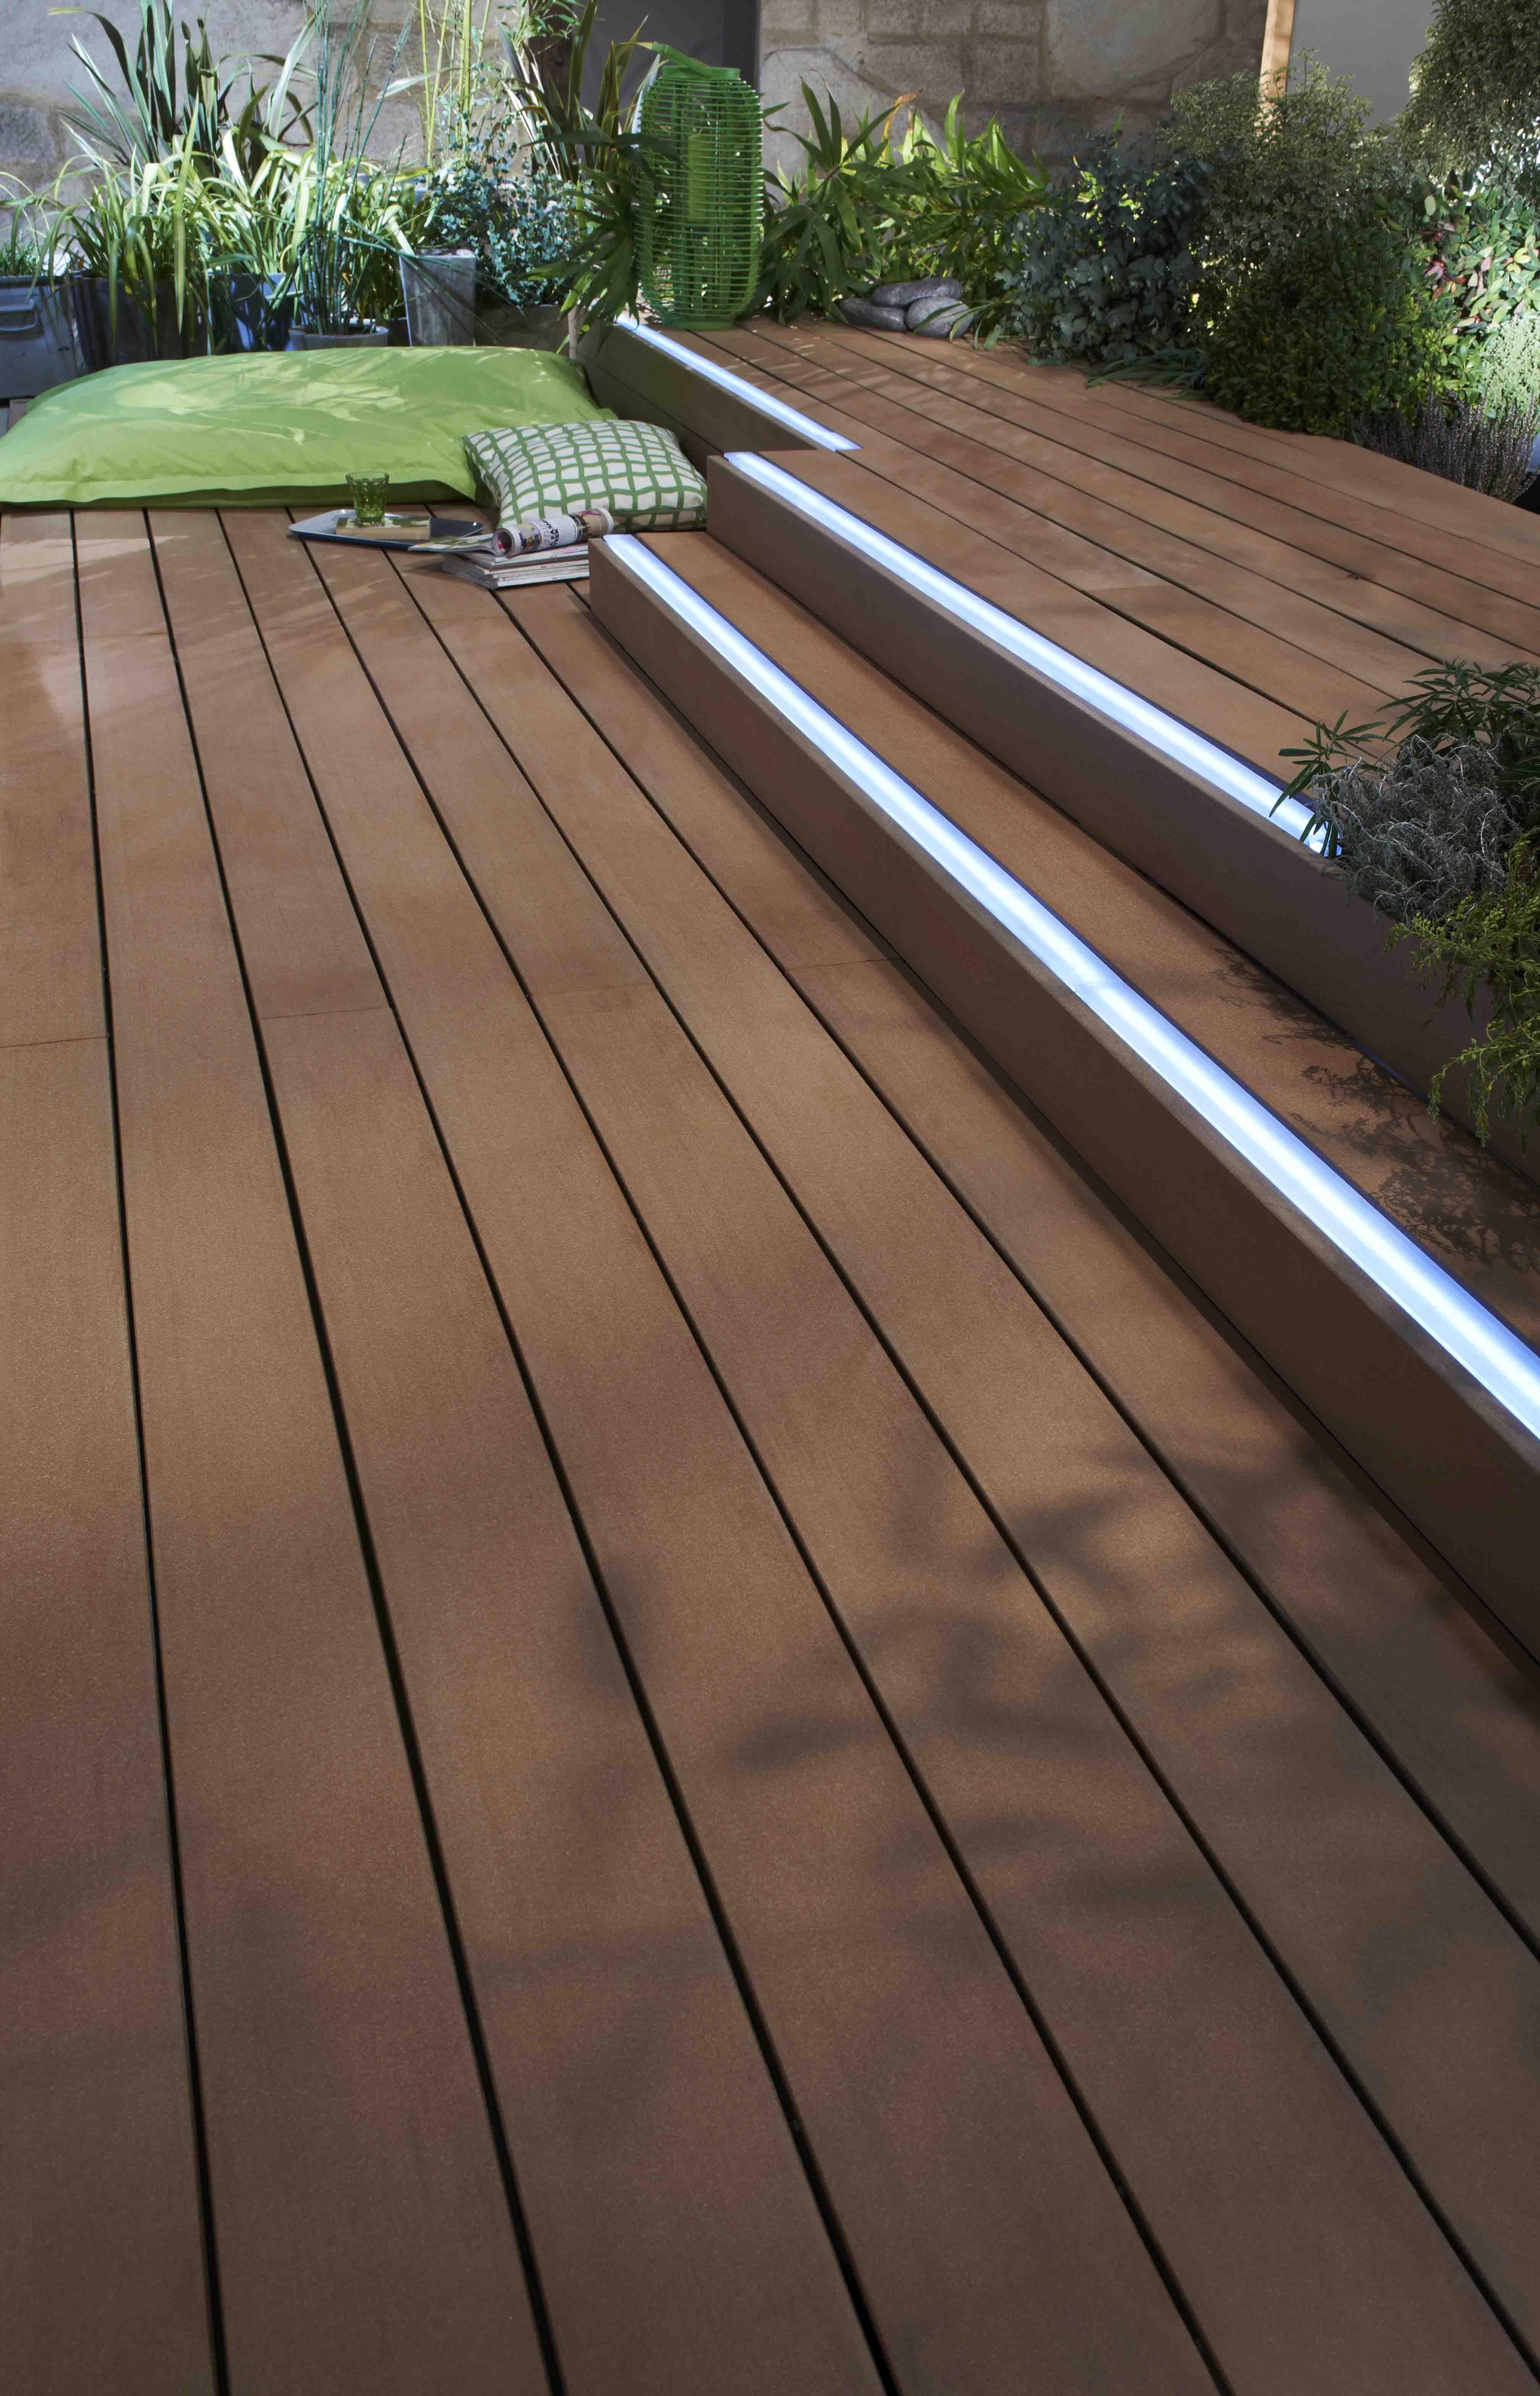 Lame de terrasse mod le bande lumineuse for Modele terrasse exterieur